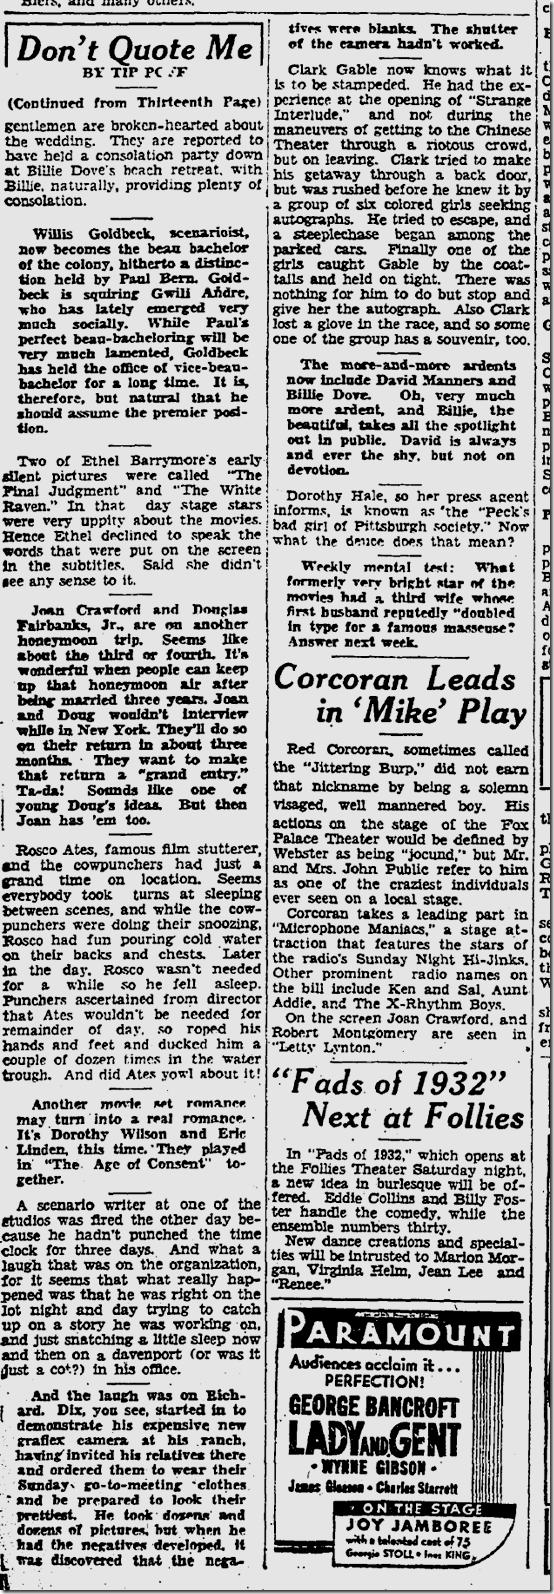 July 24, 1932, Tip Poff